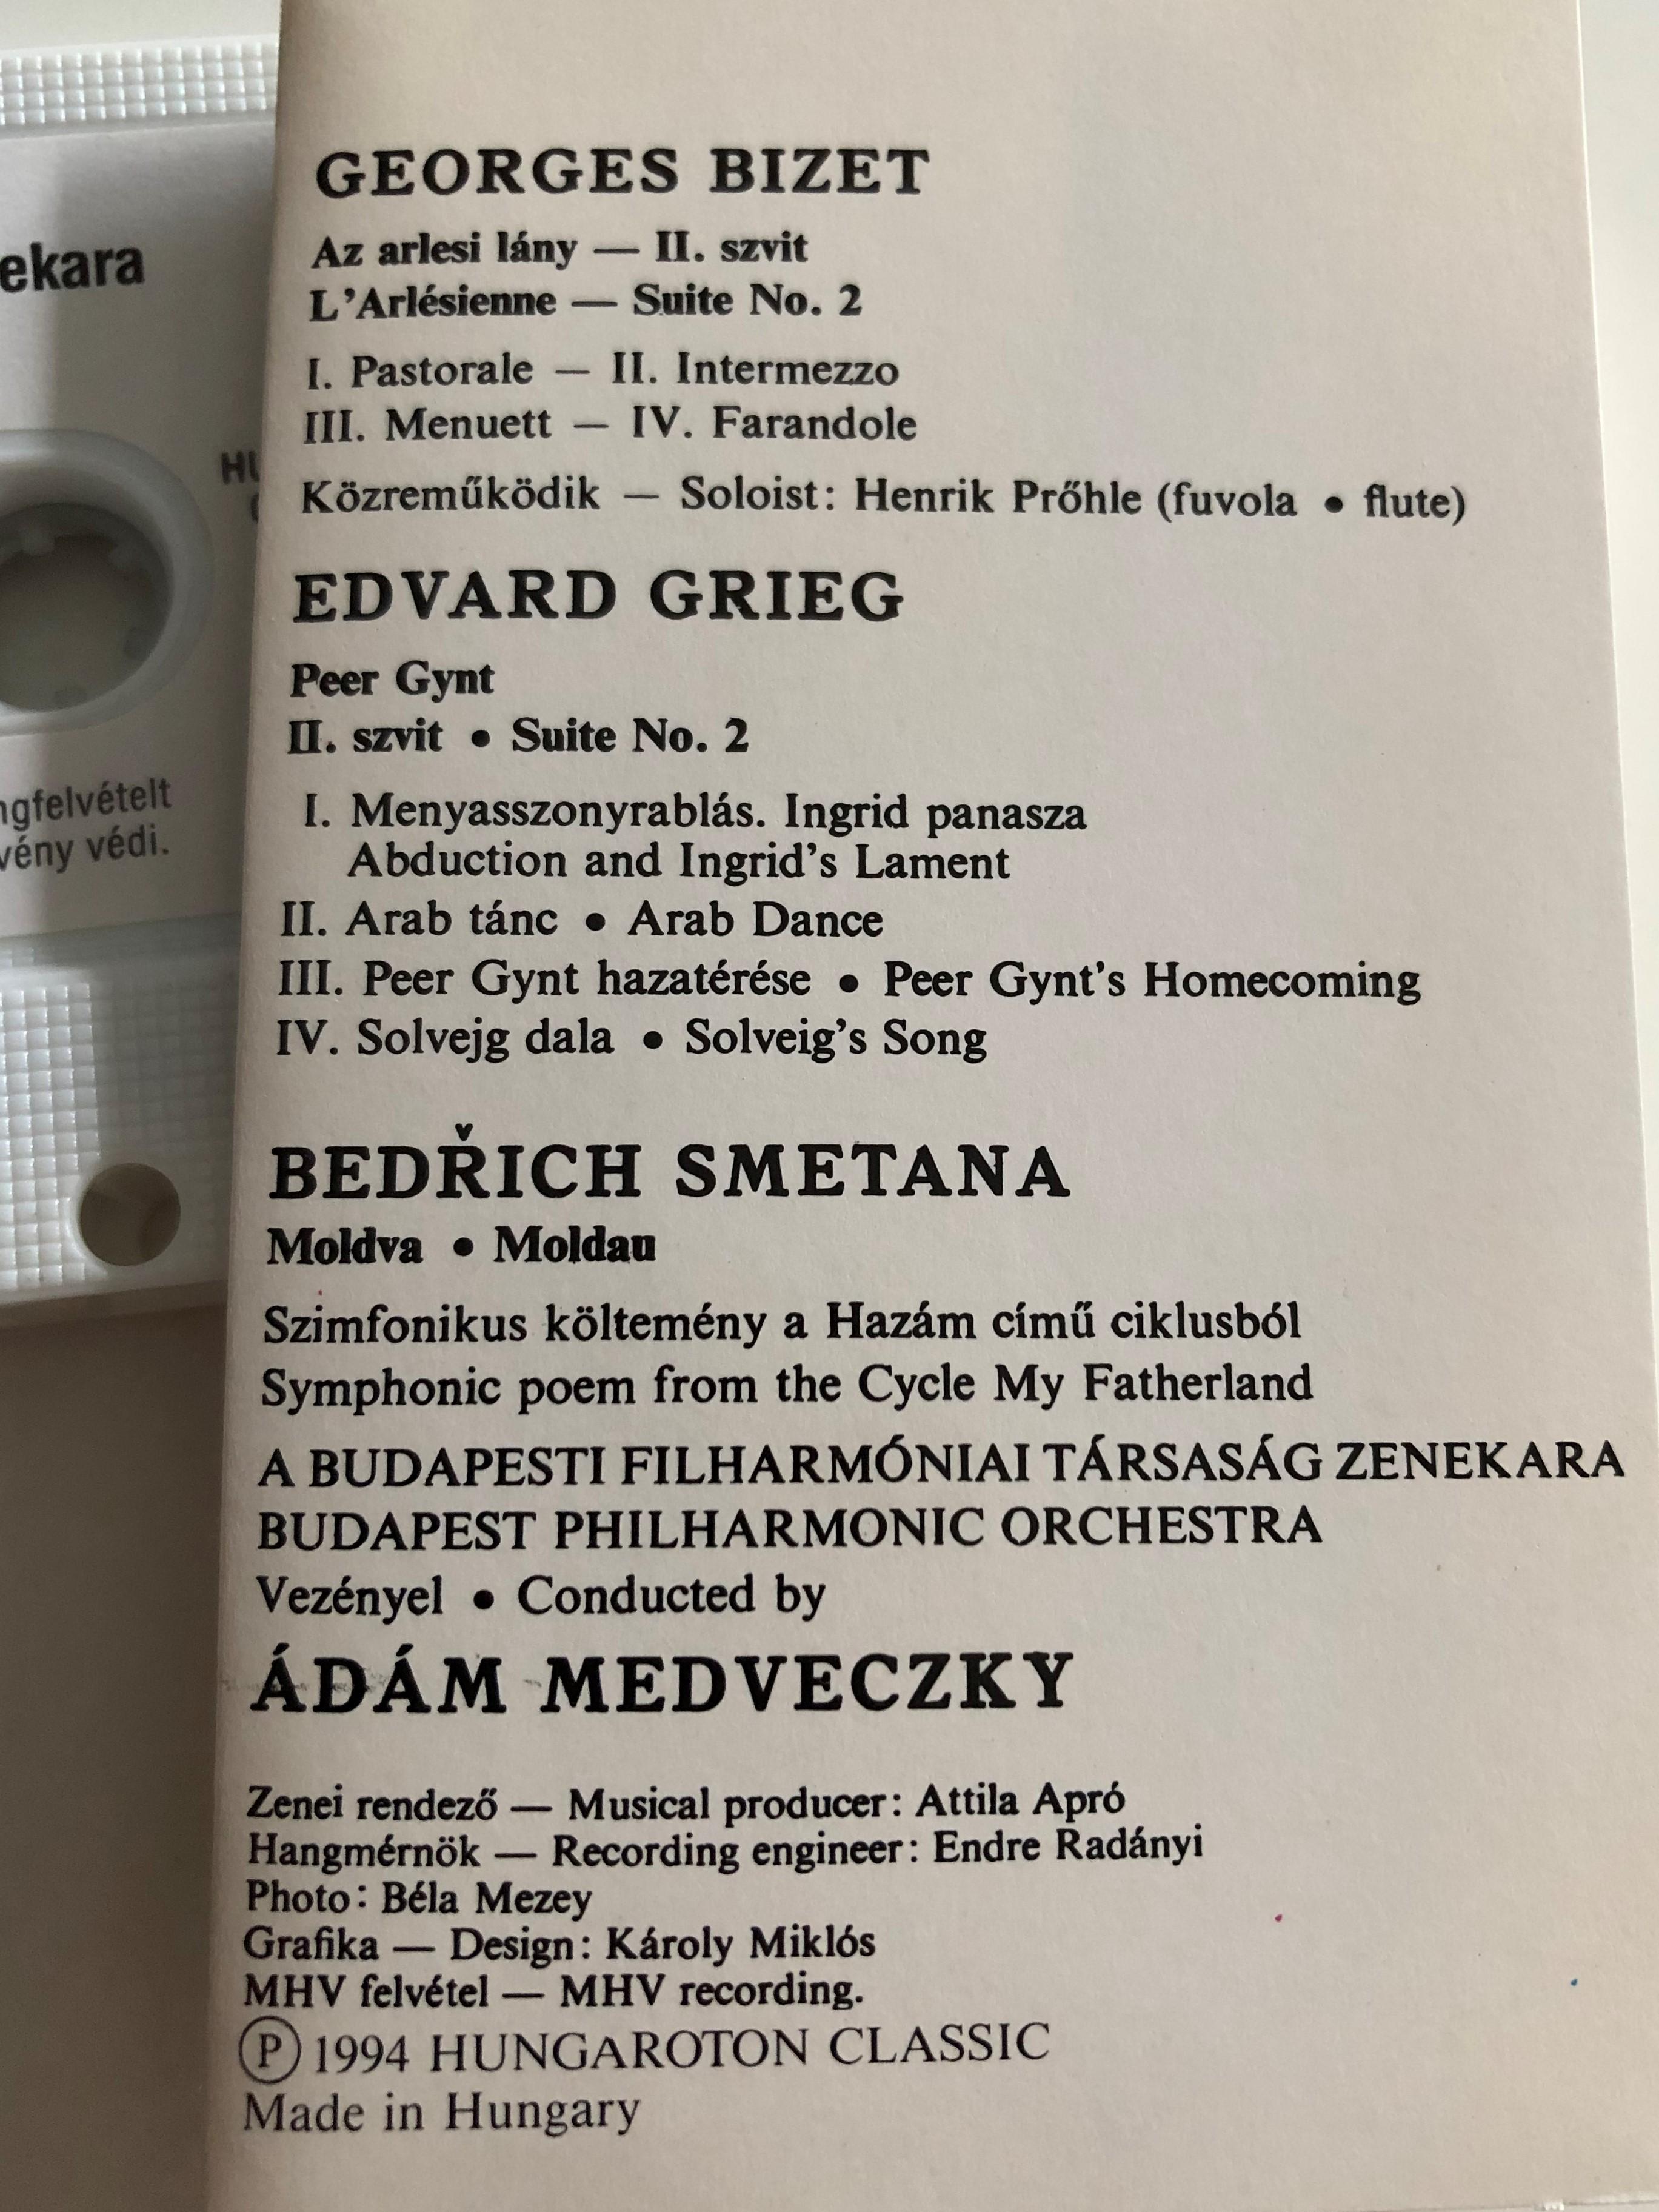 bizet-l-arlesienne-suite-no.2-grieg-peer-gynt-suite-no.2-smetana-moldau-budapest-philharmonic-orchestra-conducted-d-m-medveczky-hungaroton-cassette-stereo-mk-11813-3-.jpg